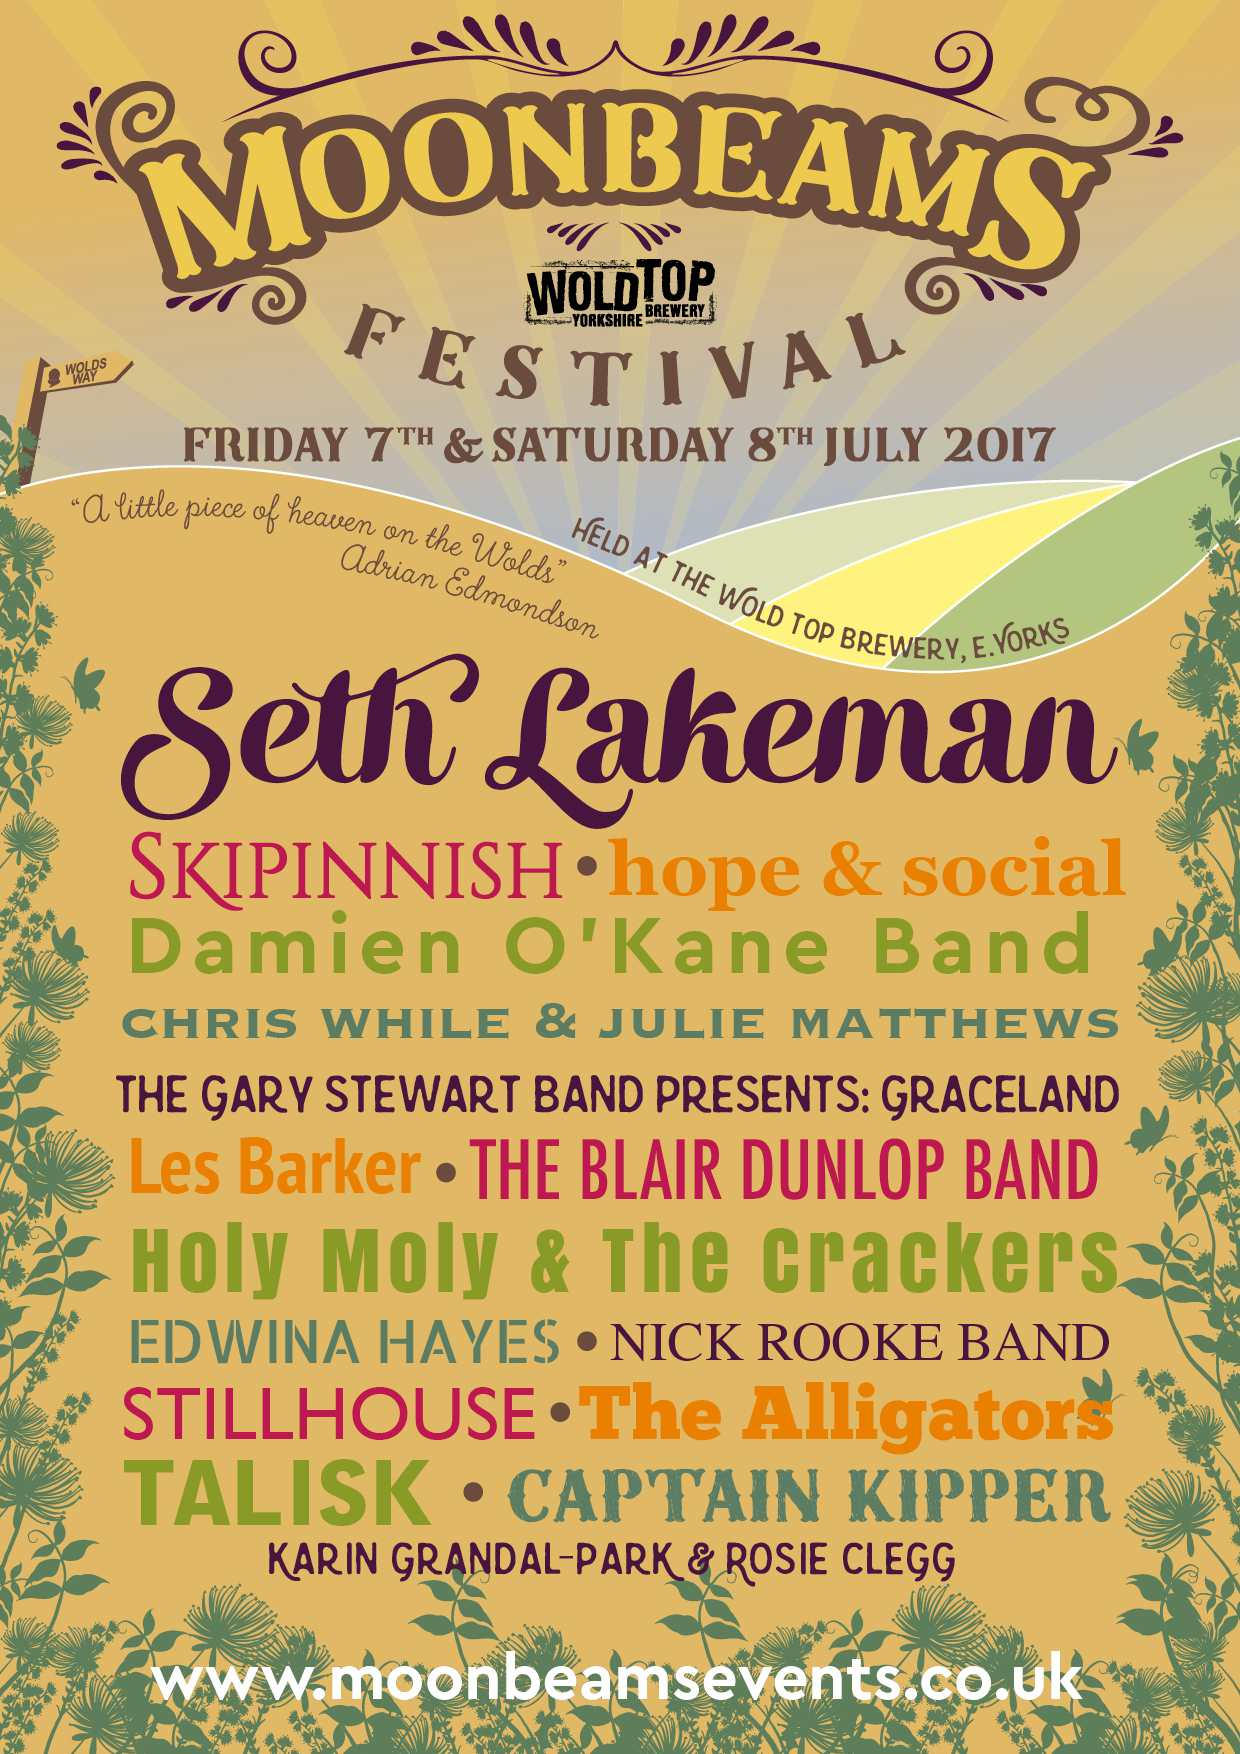 Moonbeams Festival Lineup 2017